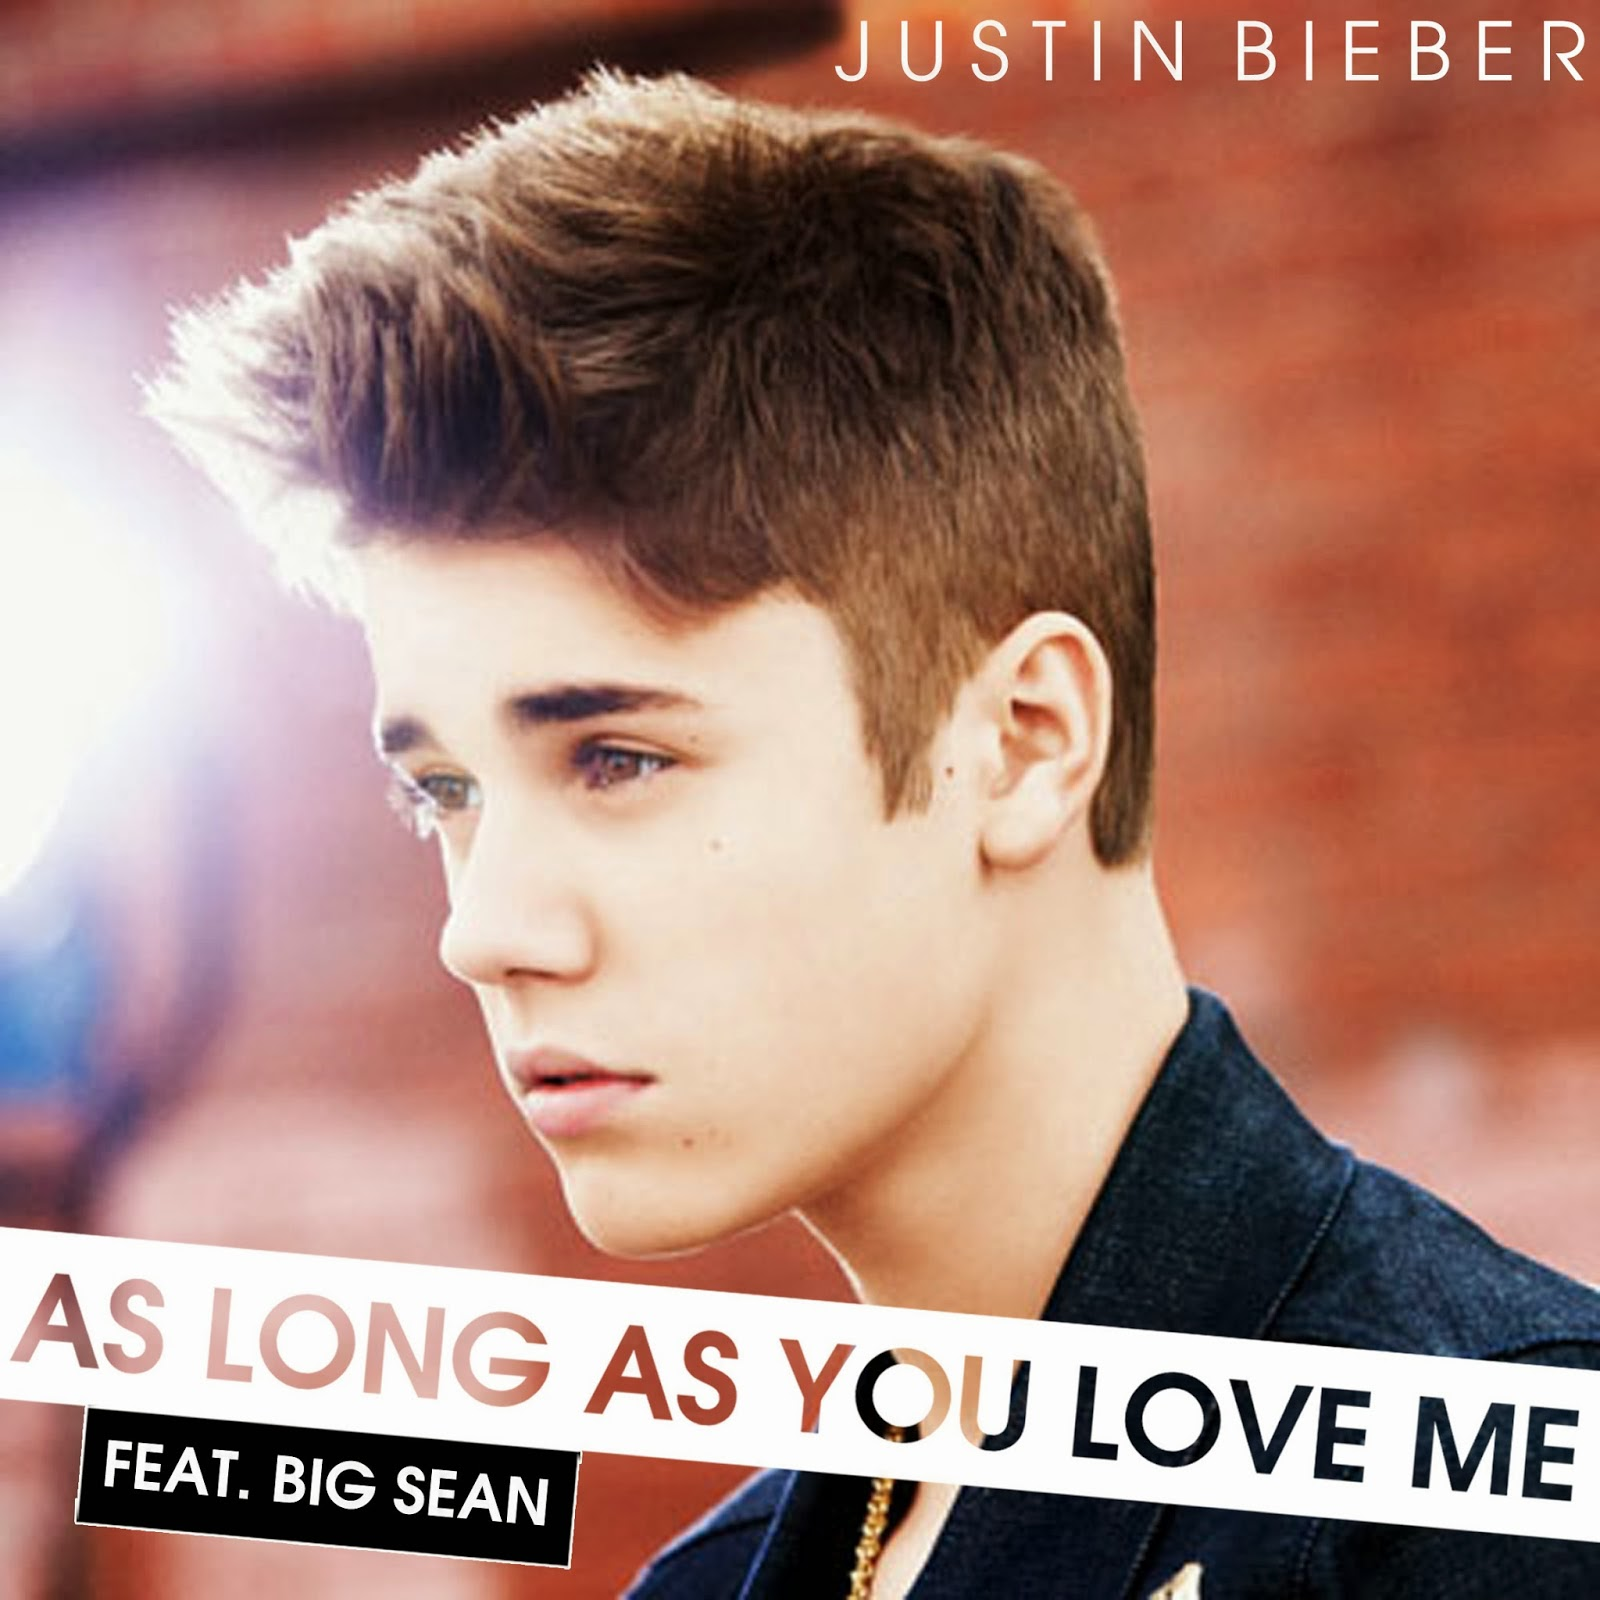 Justin Bieber Let Me Love You Free Download: HD Wallpapers Blog